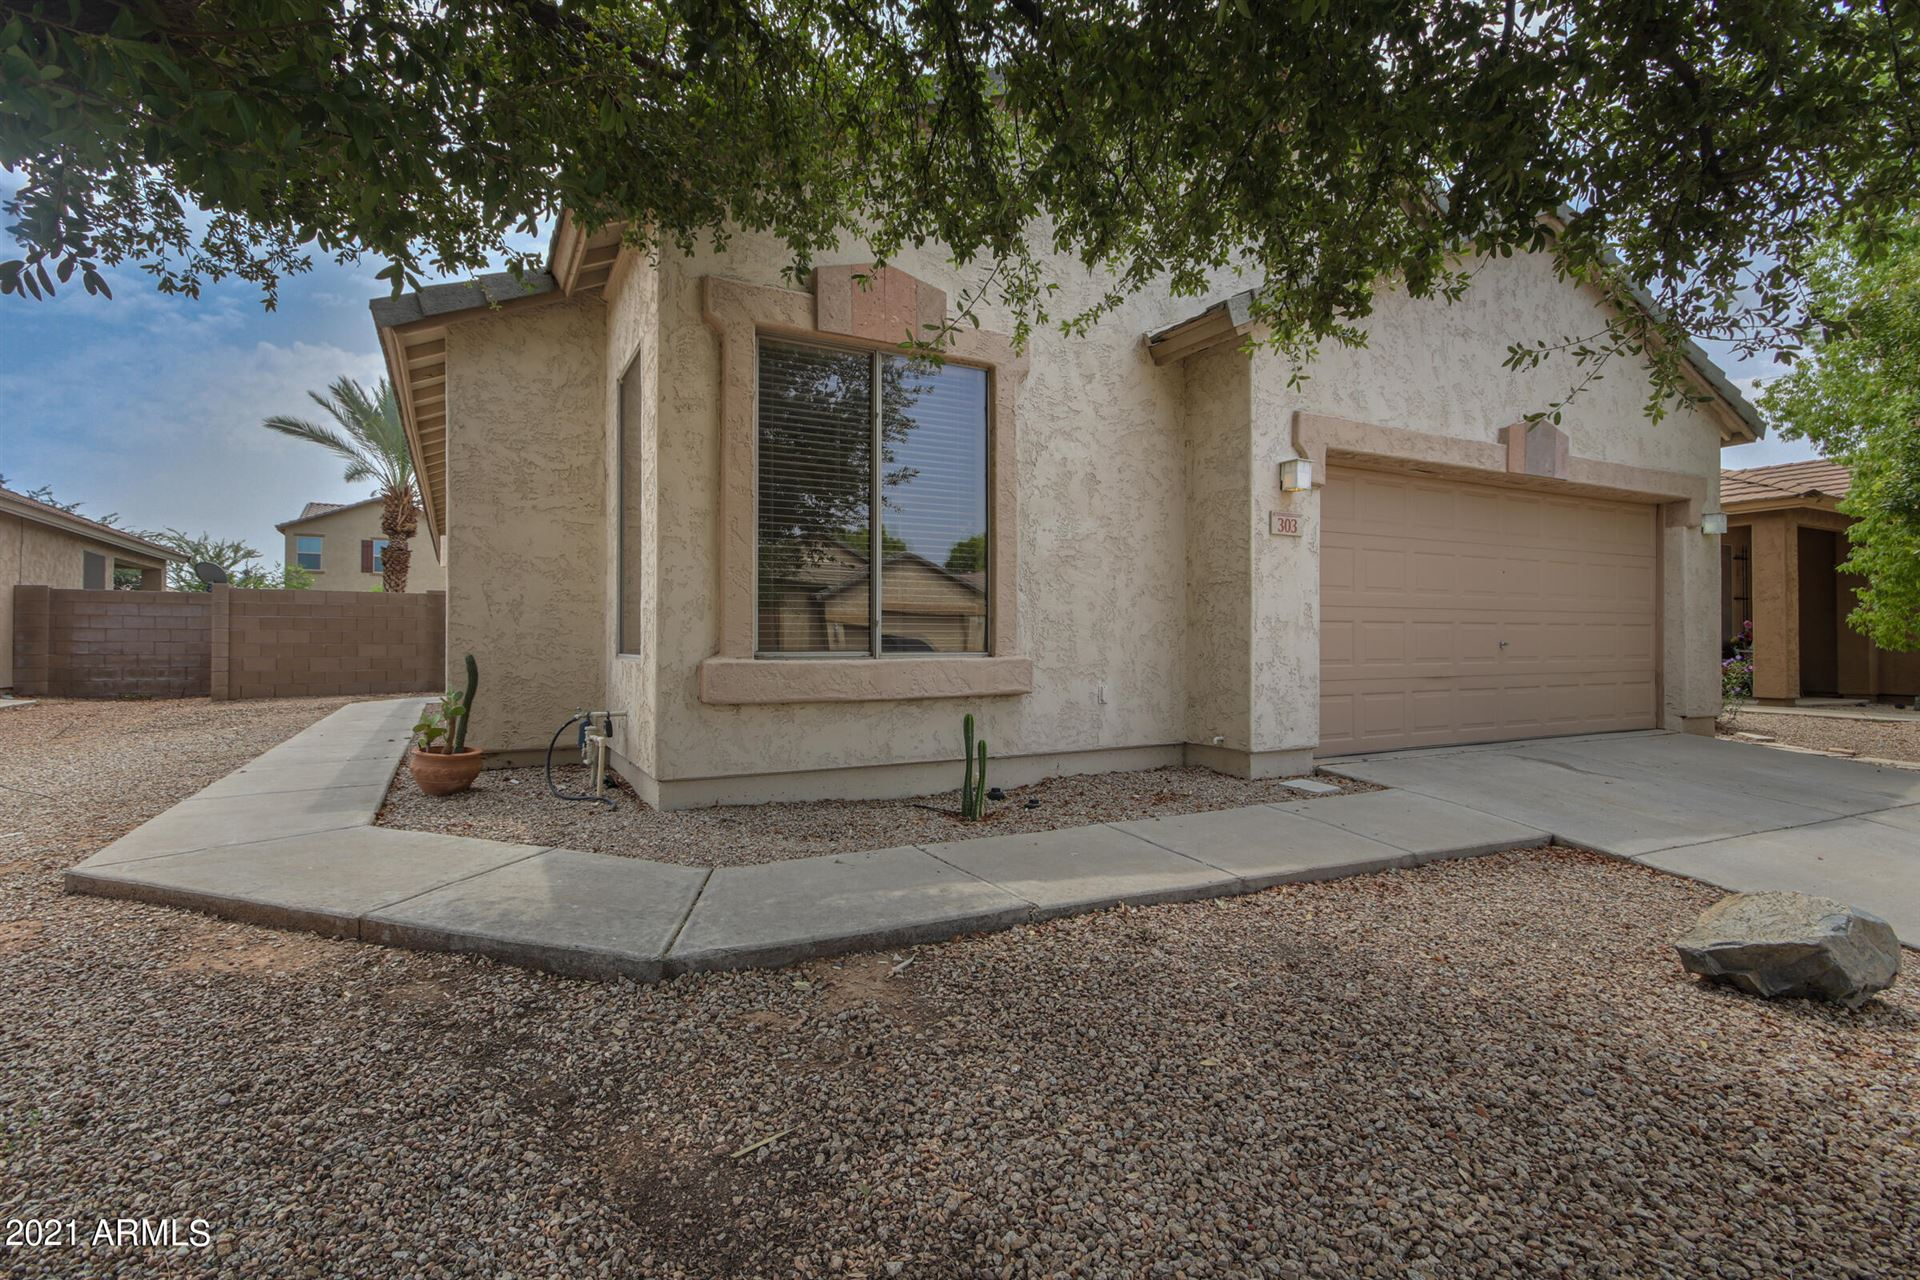 Photo of 303 N KIMBERLEE Way, Chandler, AZ 85225 (MLS # 6269004)